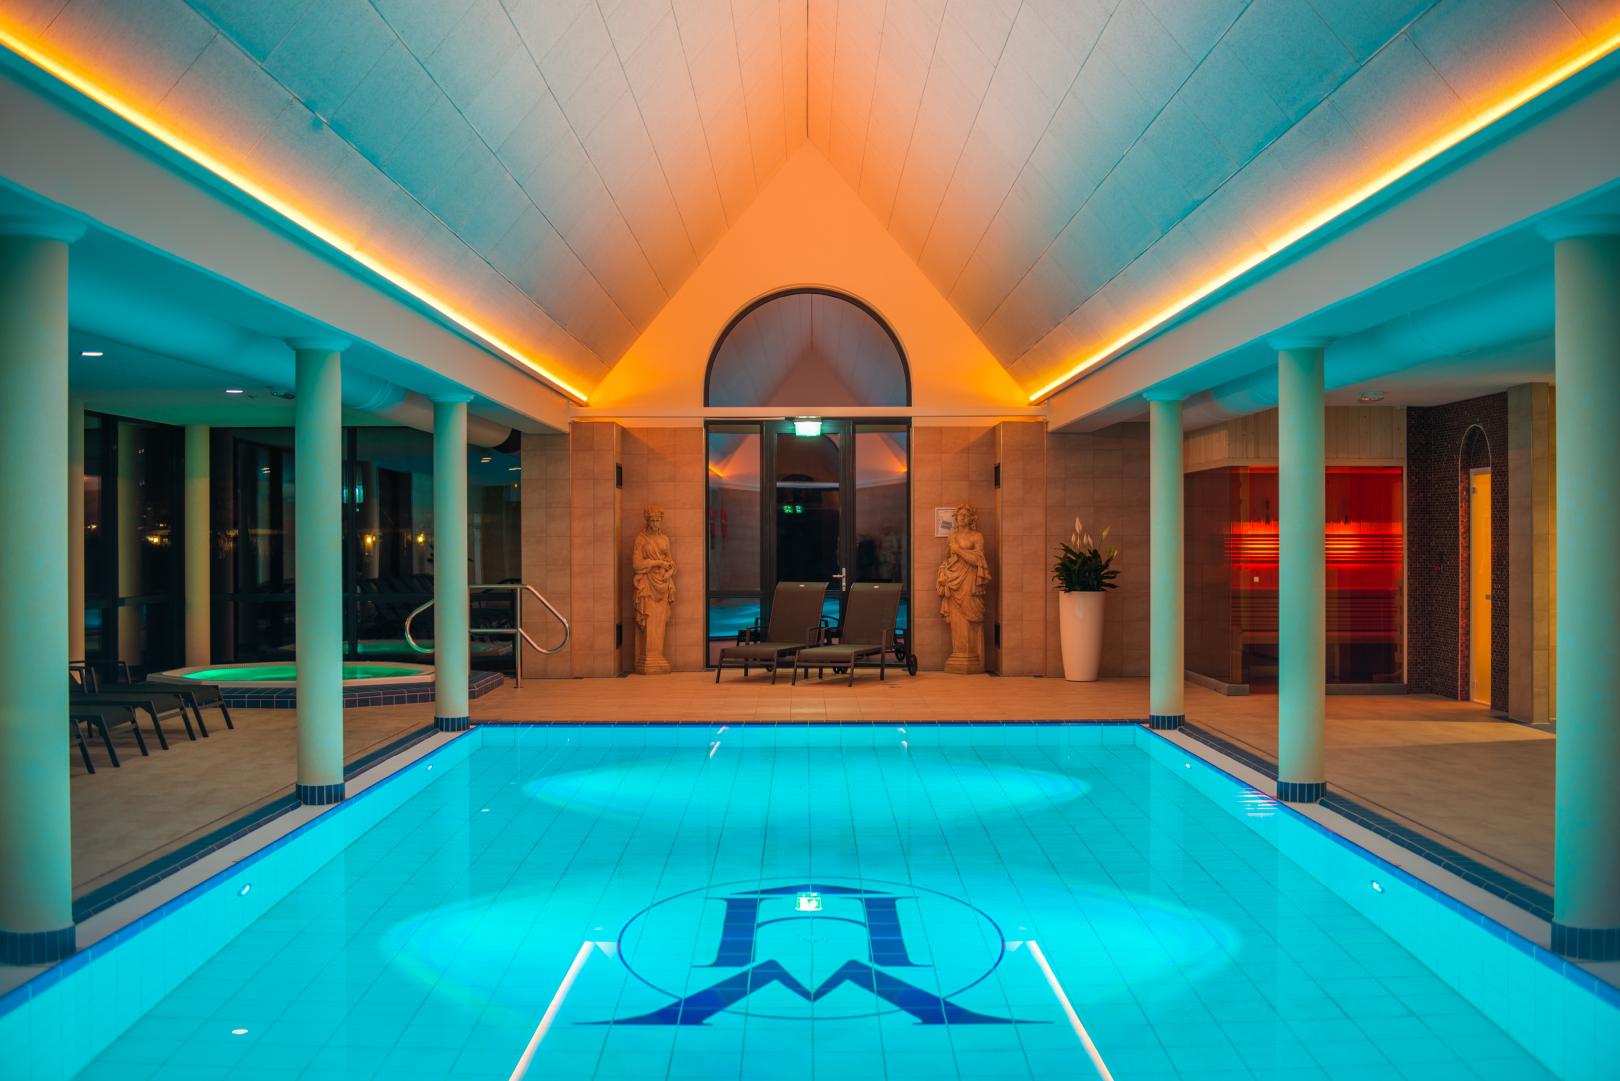 Marveld Tournament - Hotel Havezate Marveld - Pool